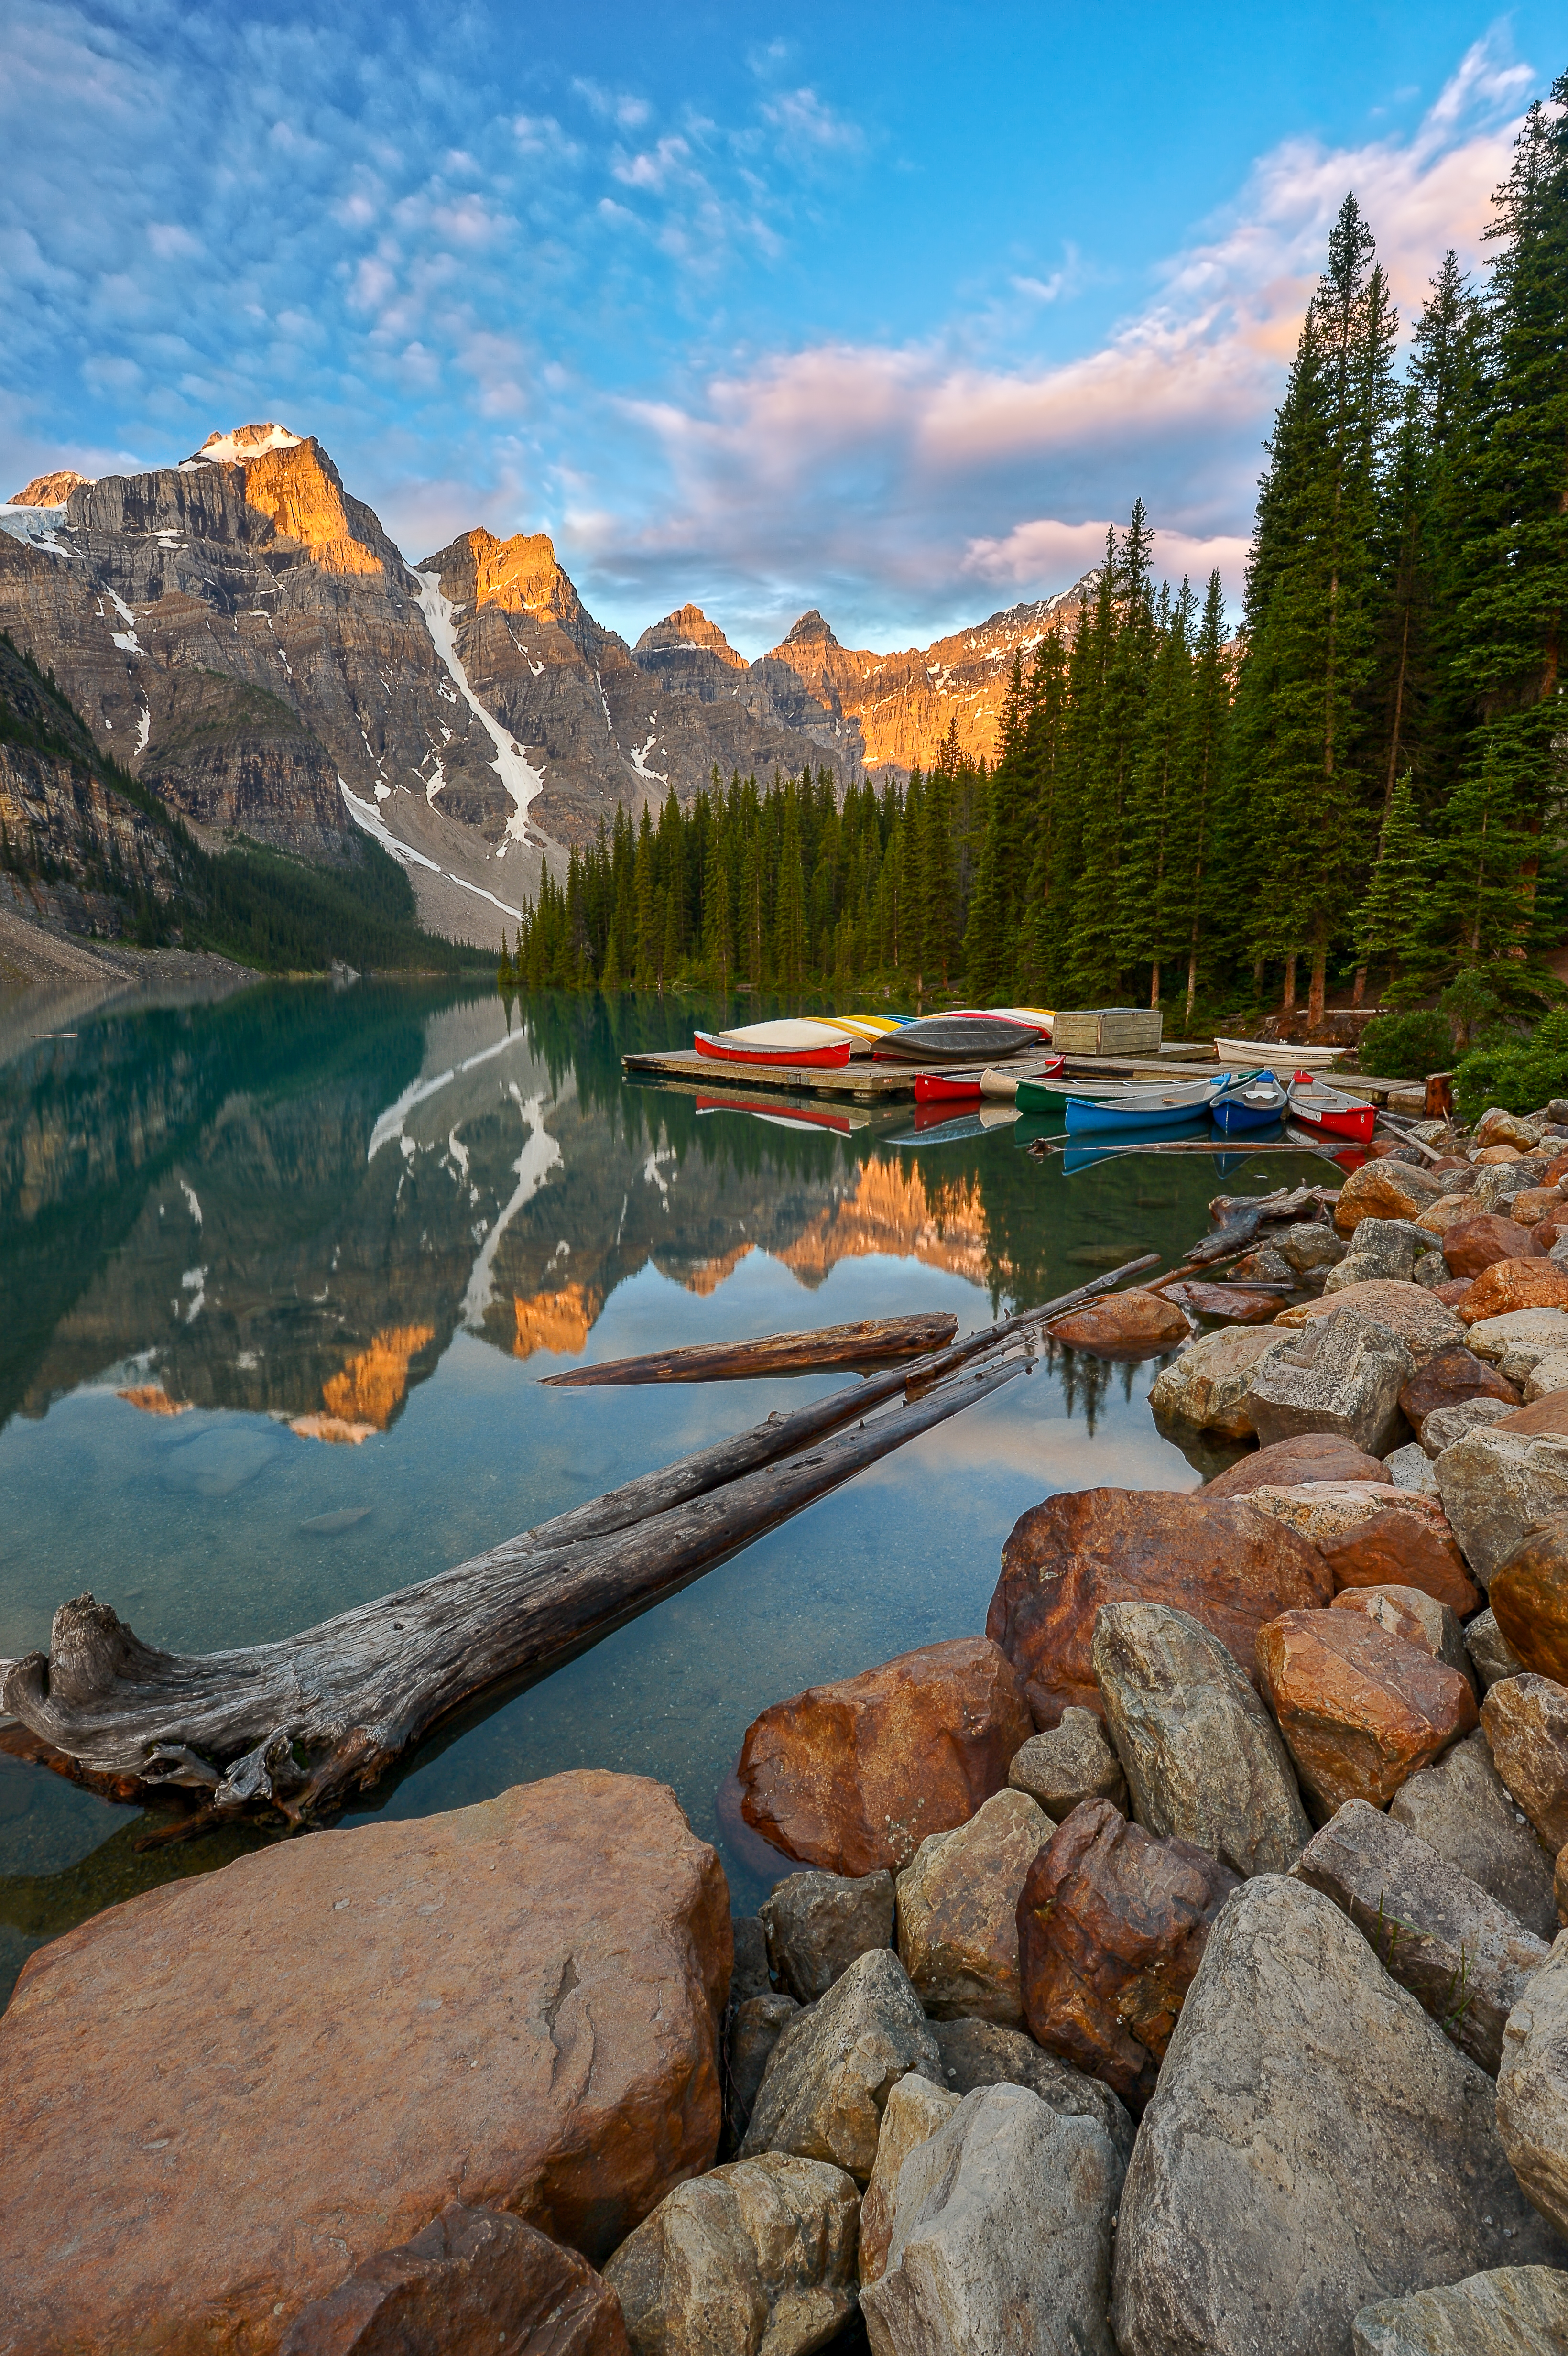 Canada, Glacier, Alberta, Banff, Moraine Lake, Canadian Rockies, Lake Louise, Jasper National Park, Rocky Mountains, Lake Minnewanka, Icefields Parkway, Banff National Park, Mount Rundle, photo